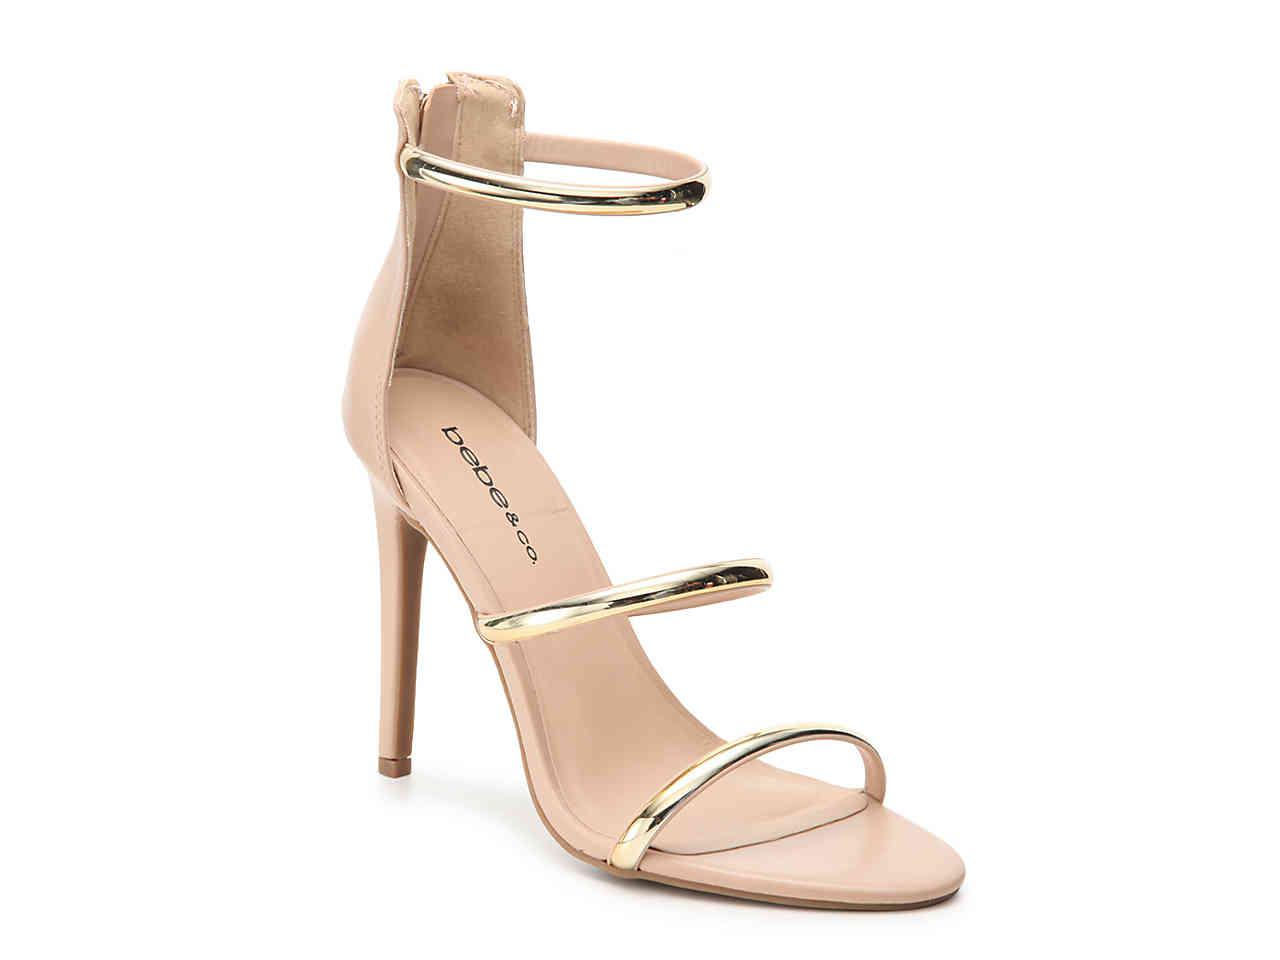 603ae629bea Lyst - Bebe Berdine Sandal in Metallic